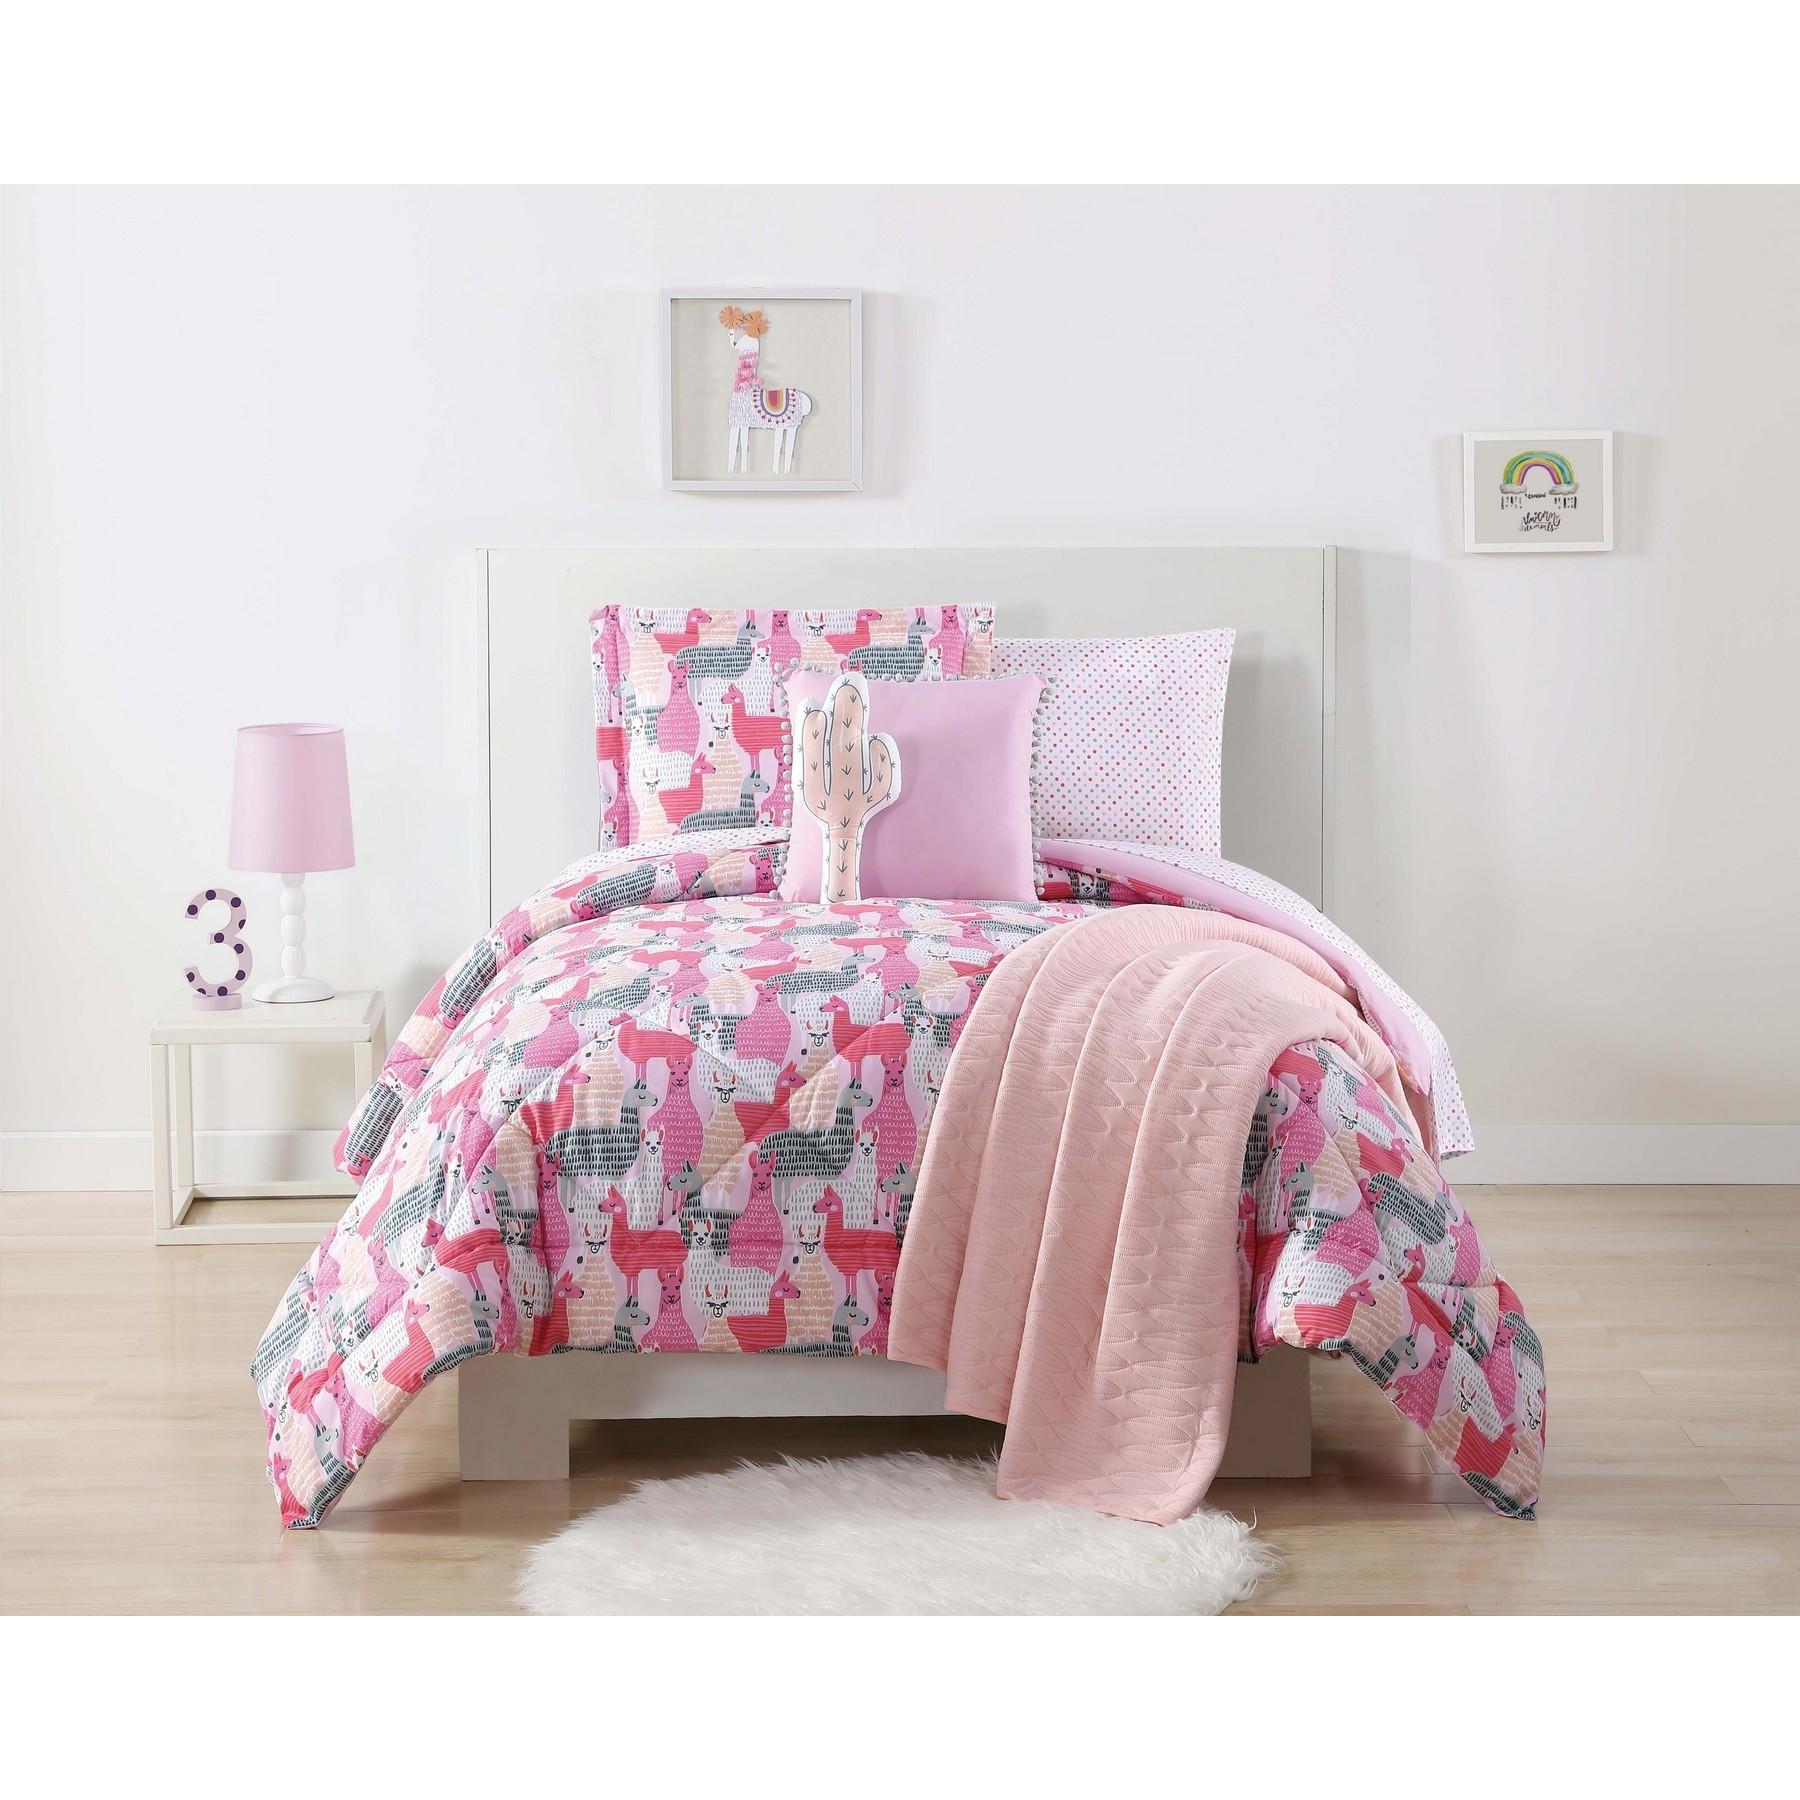 Laura Hart Kids Llama Llama Printed Twin XL Comforter Set